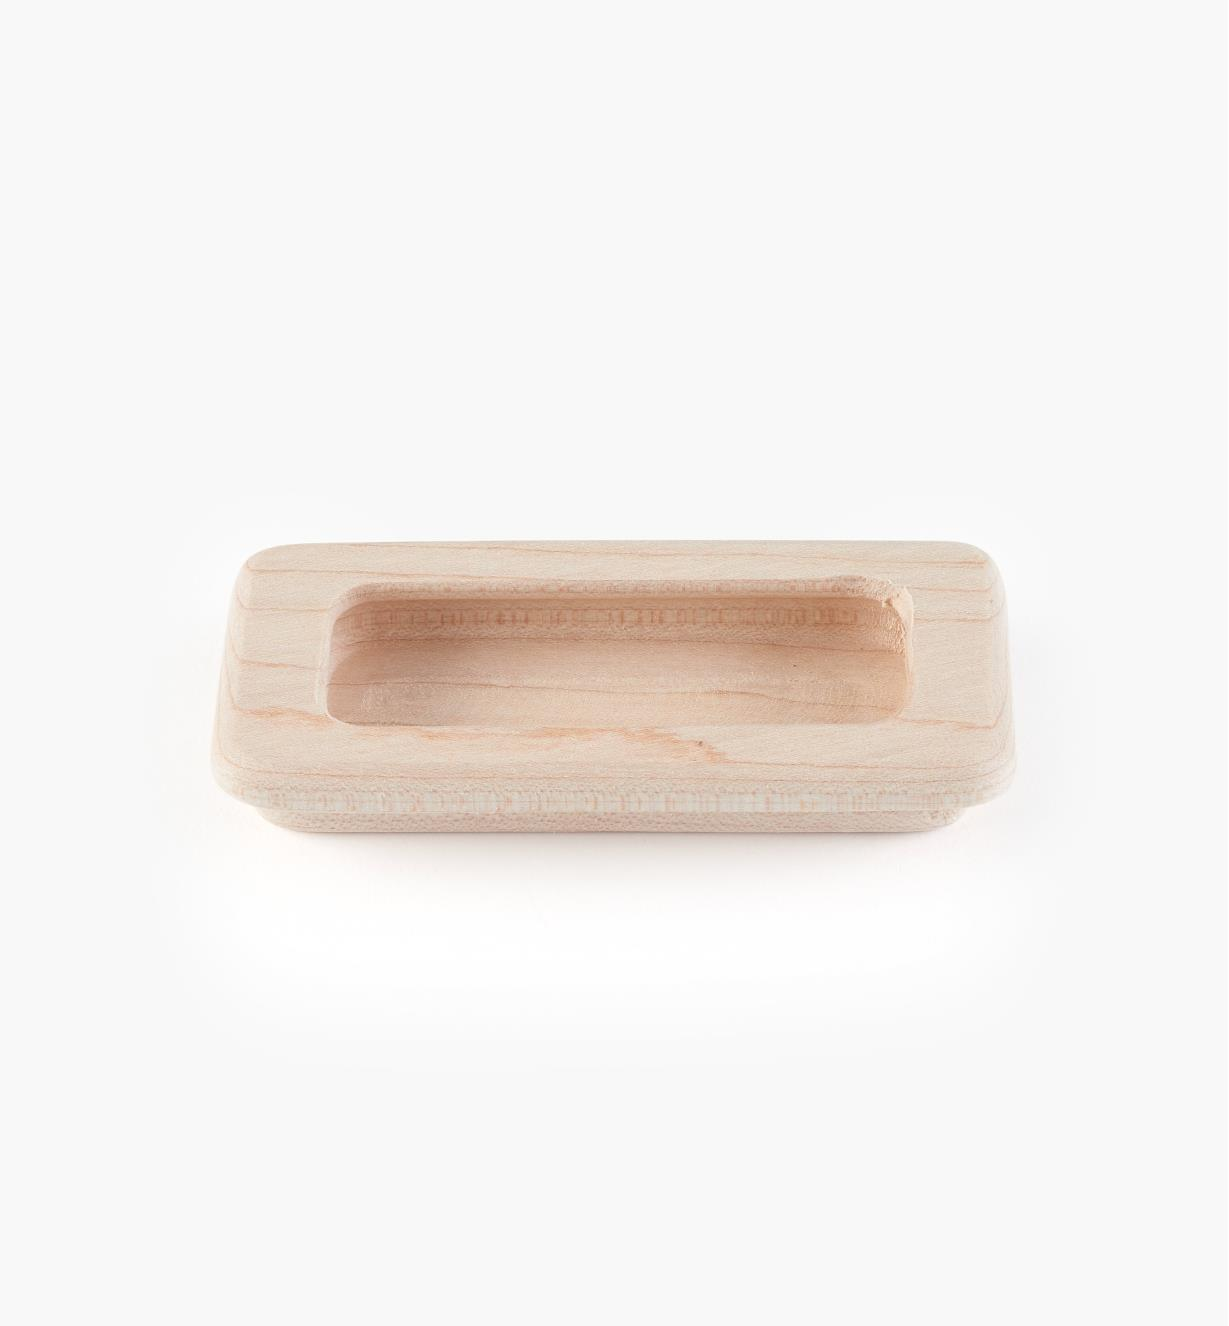 02G1315 - Maple Pull